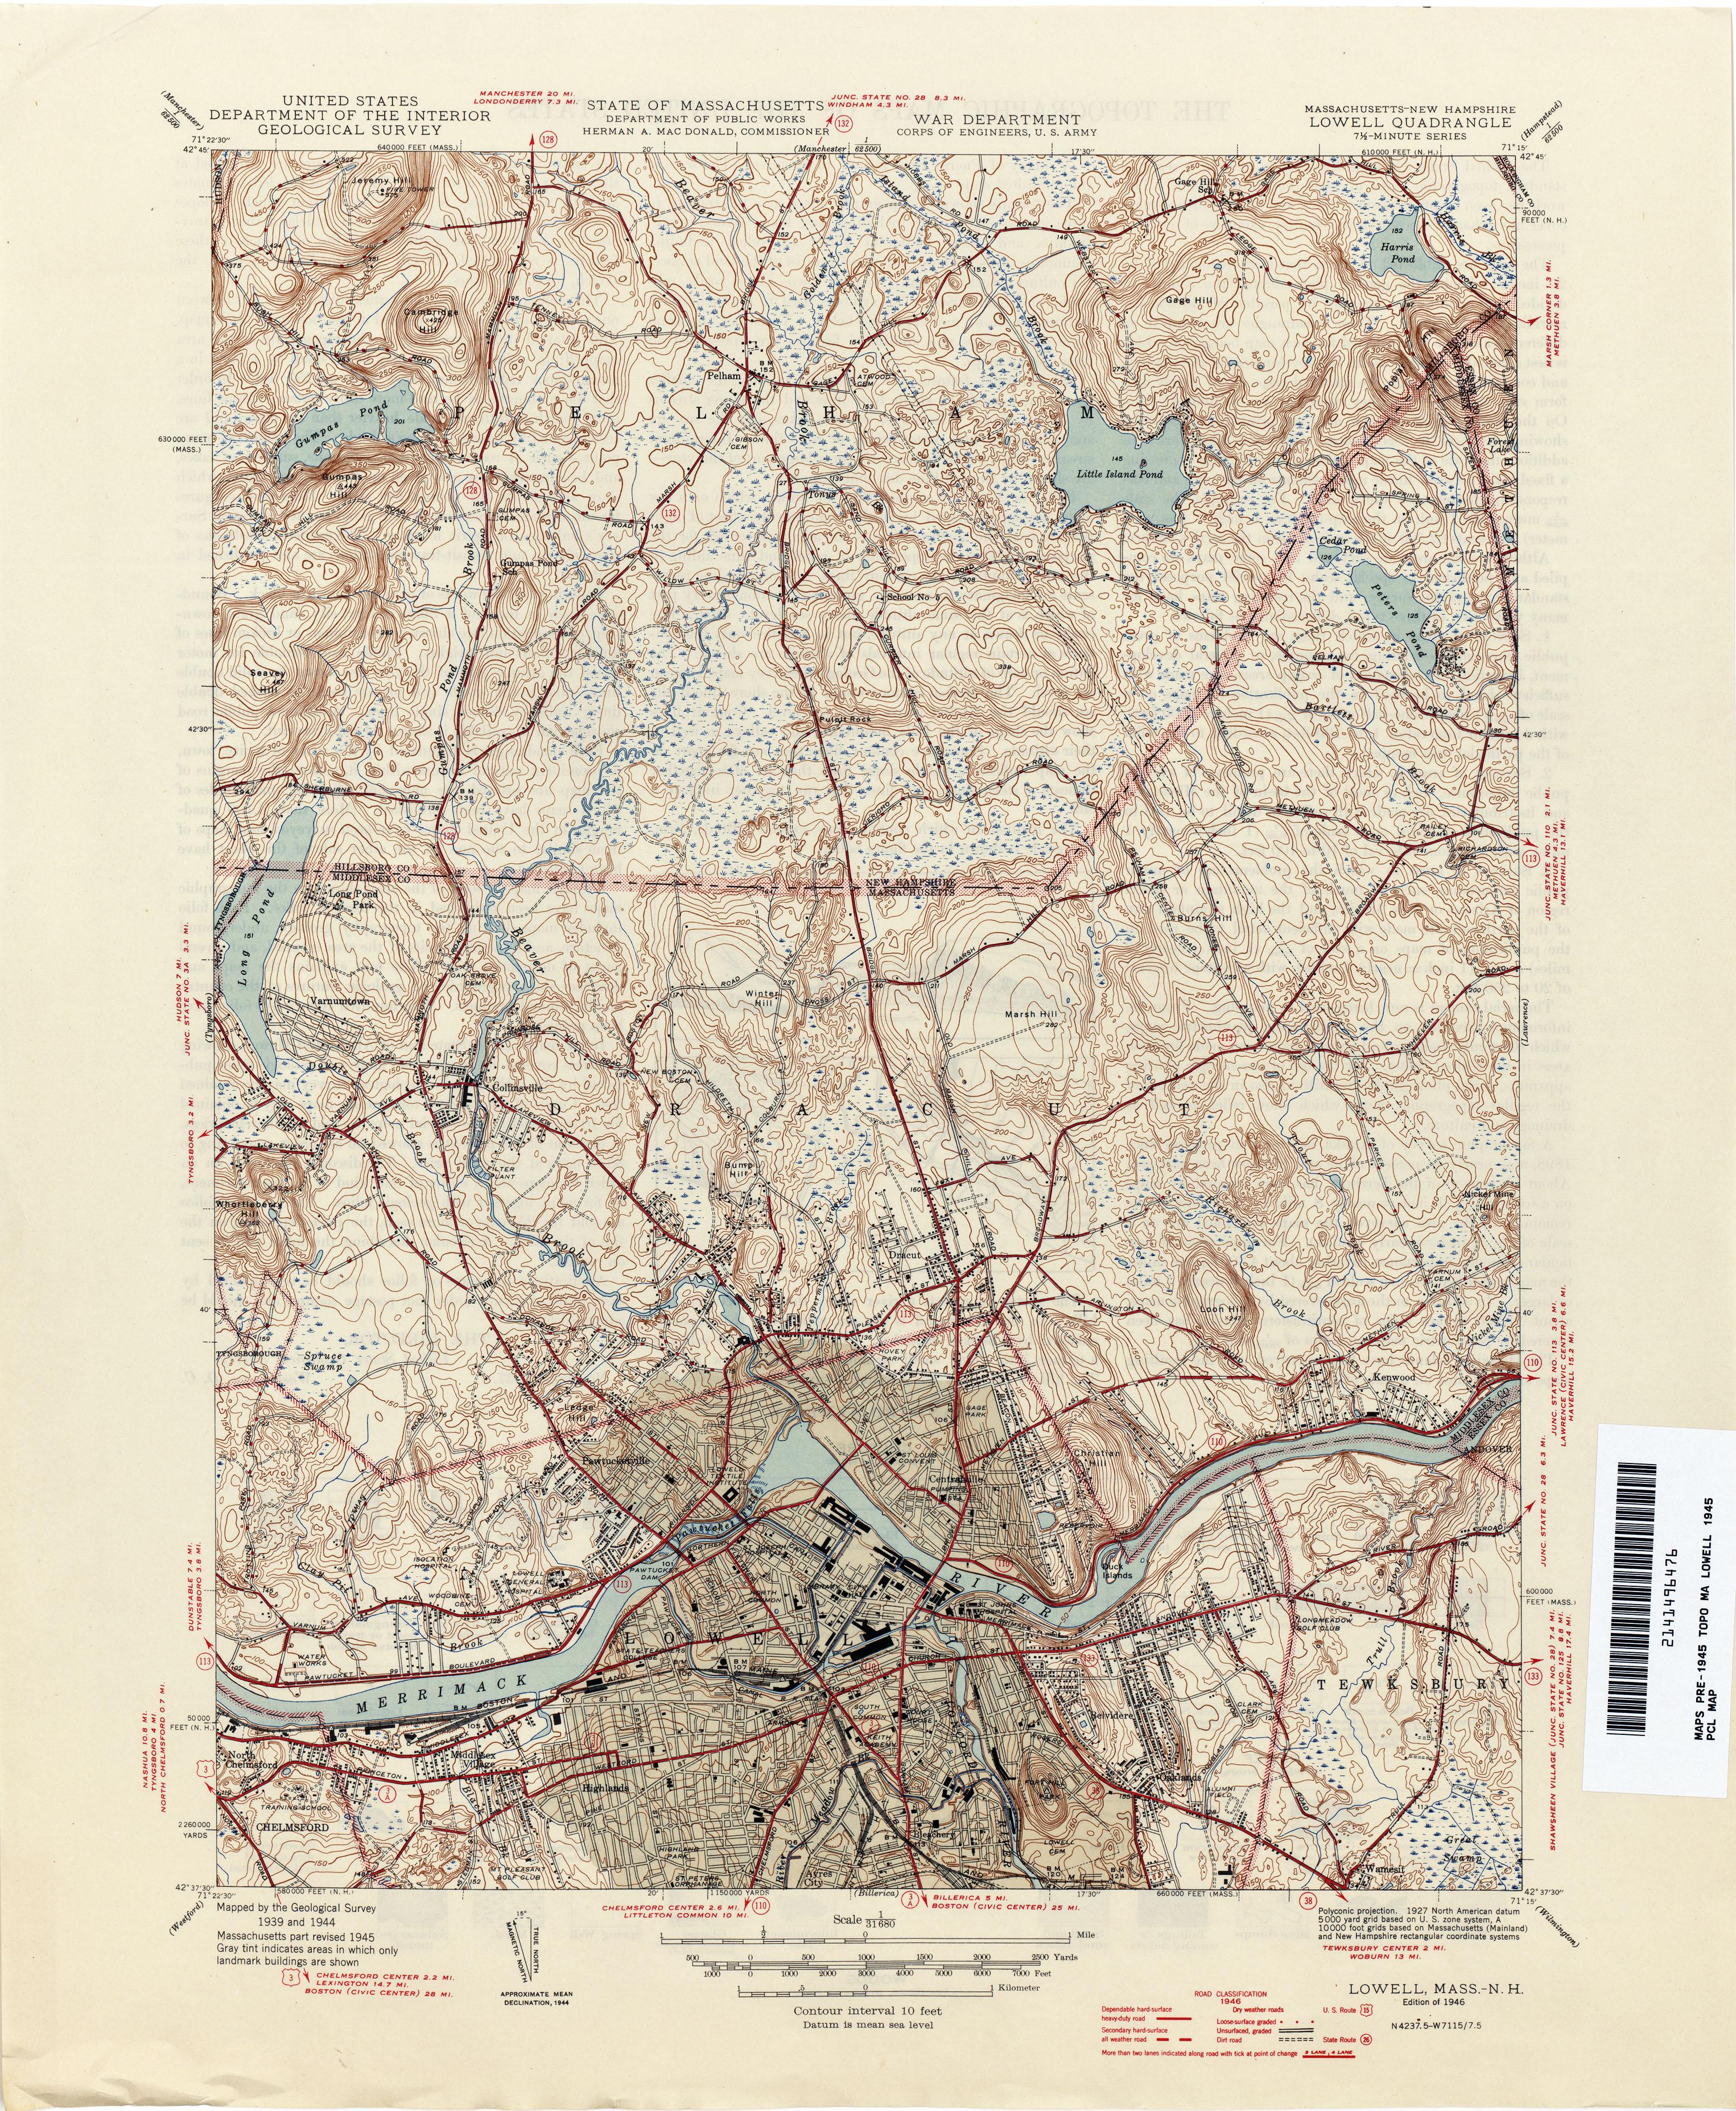 Topographic Map Massachusetts.Massachusetts Historical Topographic Maps Perry Castaneda Map